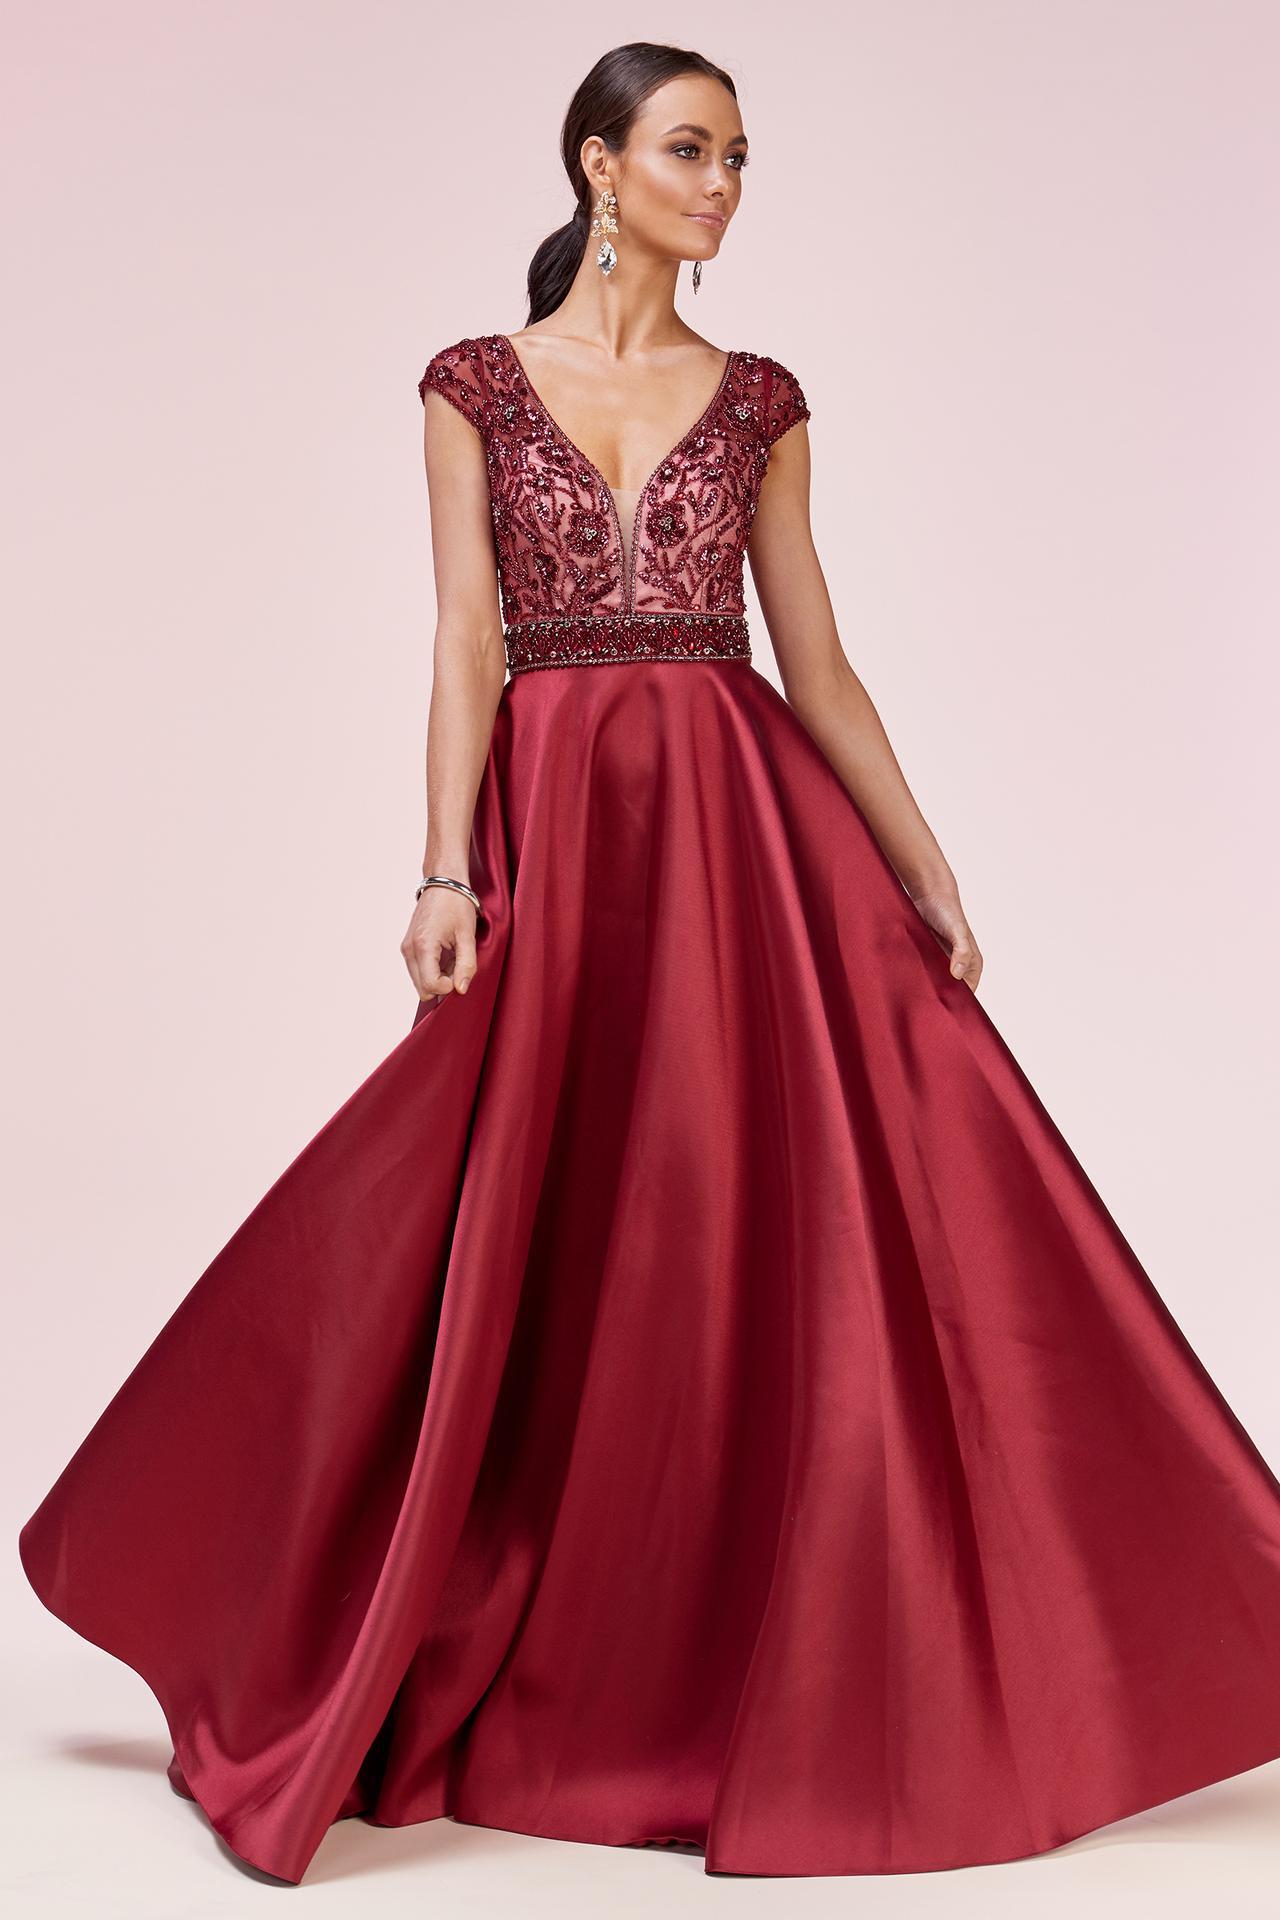 Nové spoločenské šaty :) - Obrázok č. 28